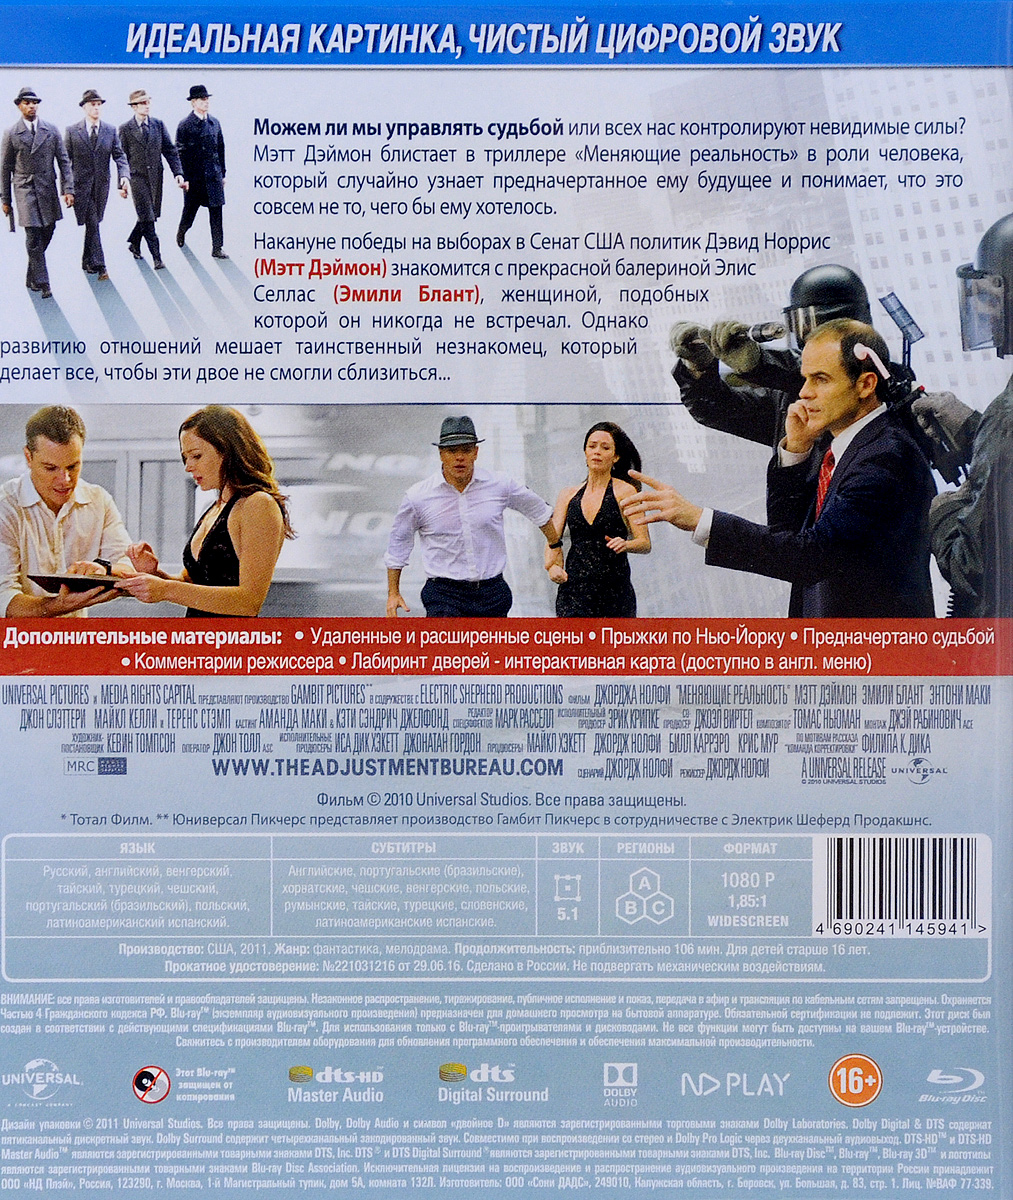 Меняющие реальность (Blu-ray) Universal Pictures,Media Rights Capital,Gambit Pictures